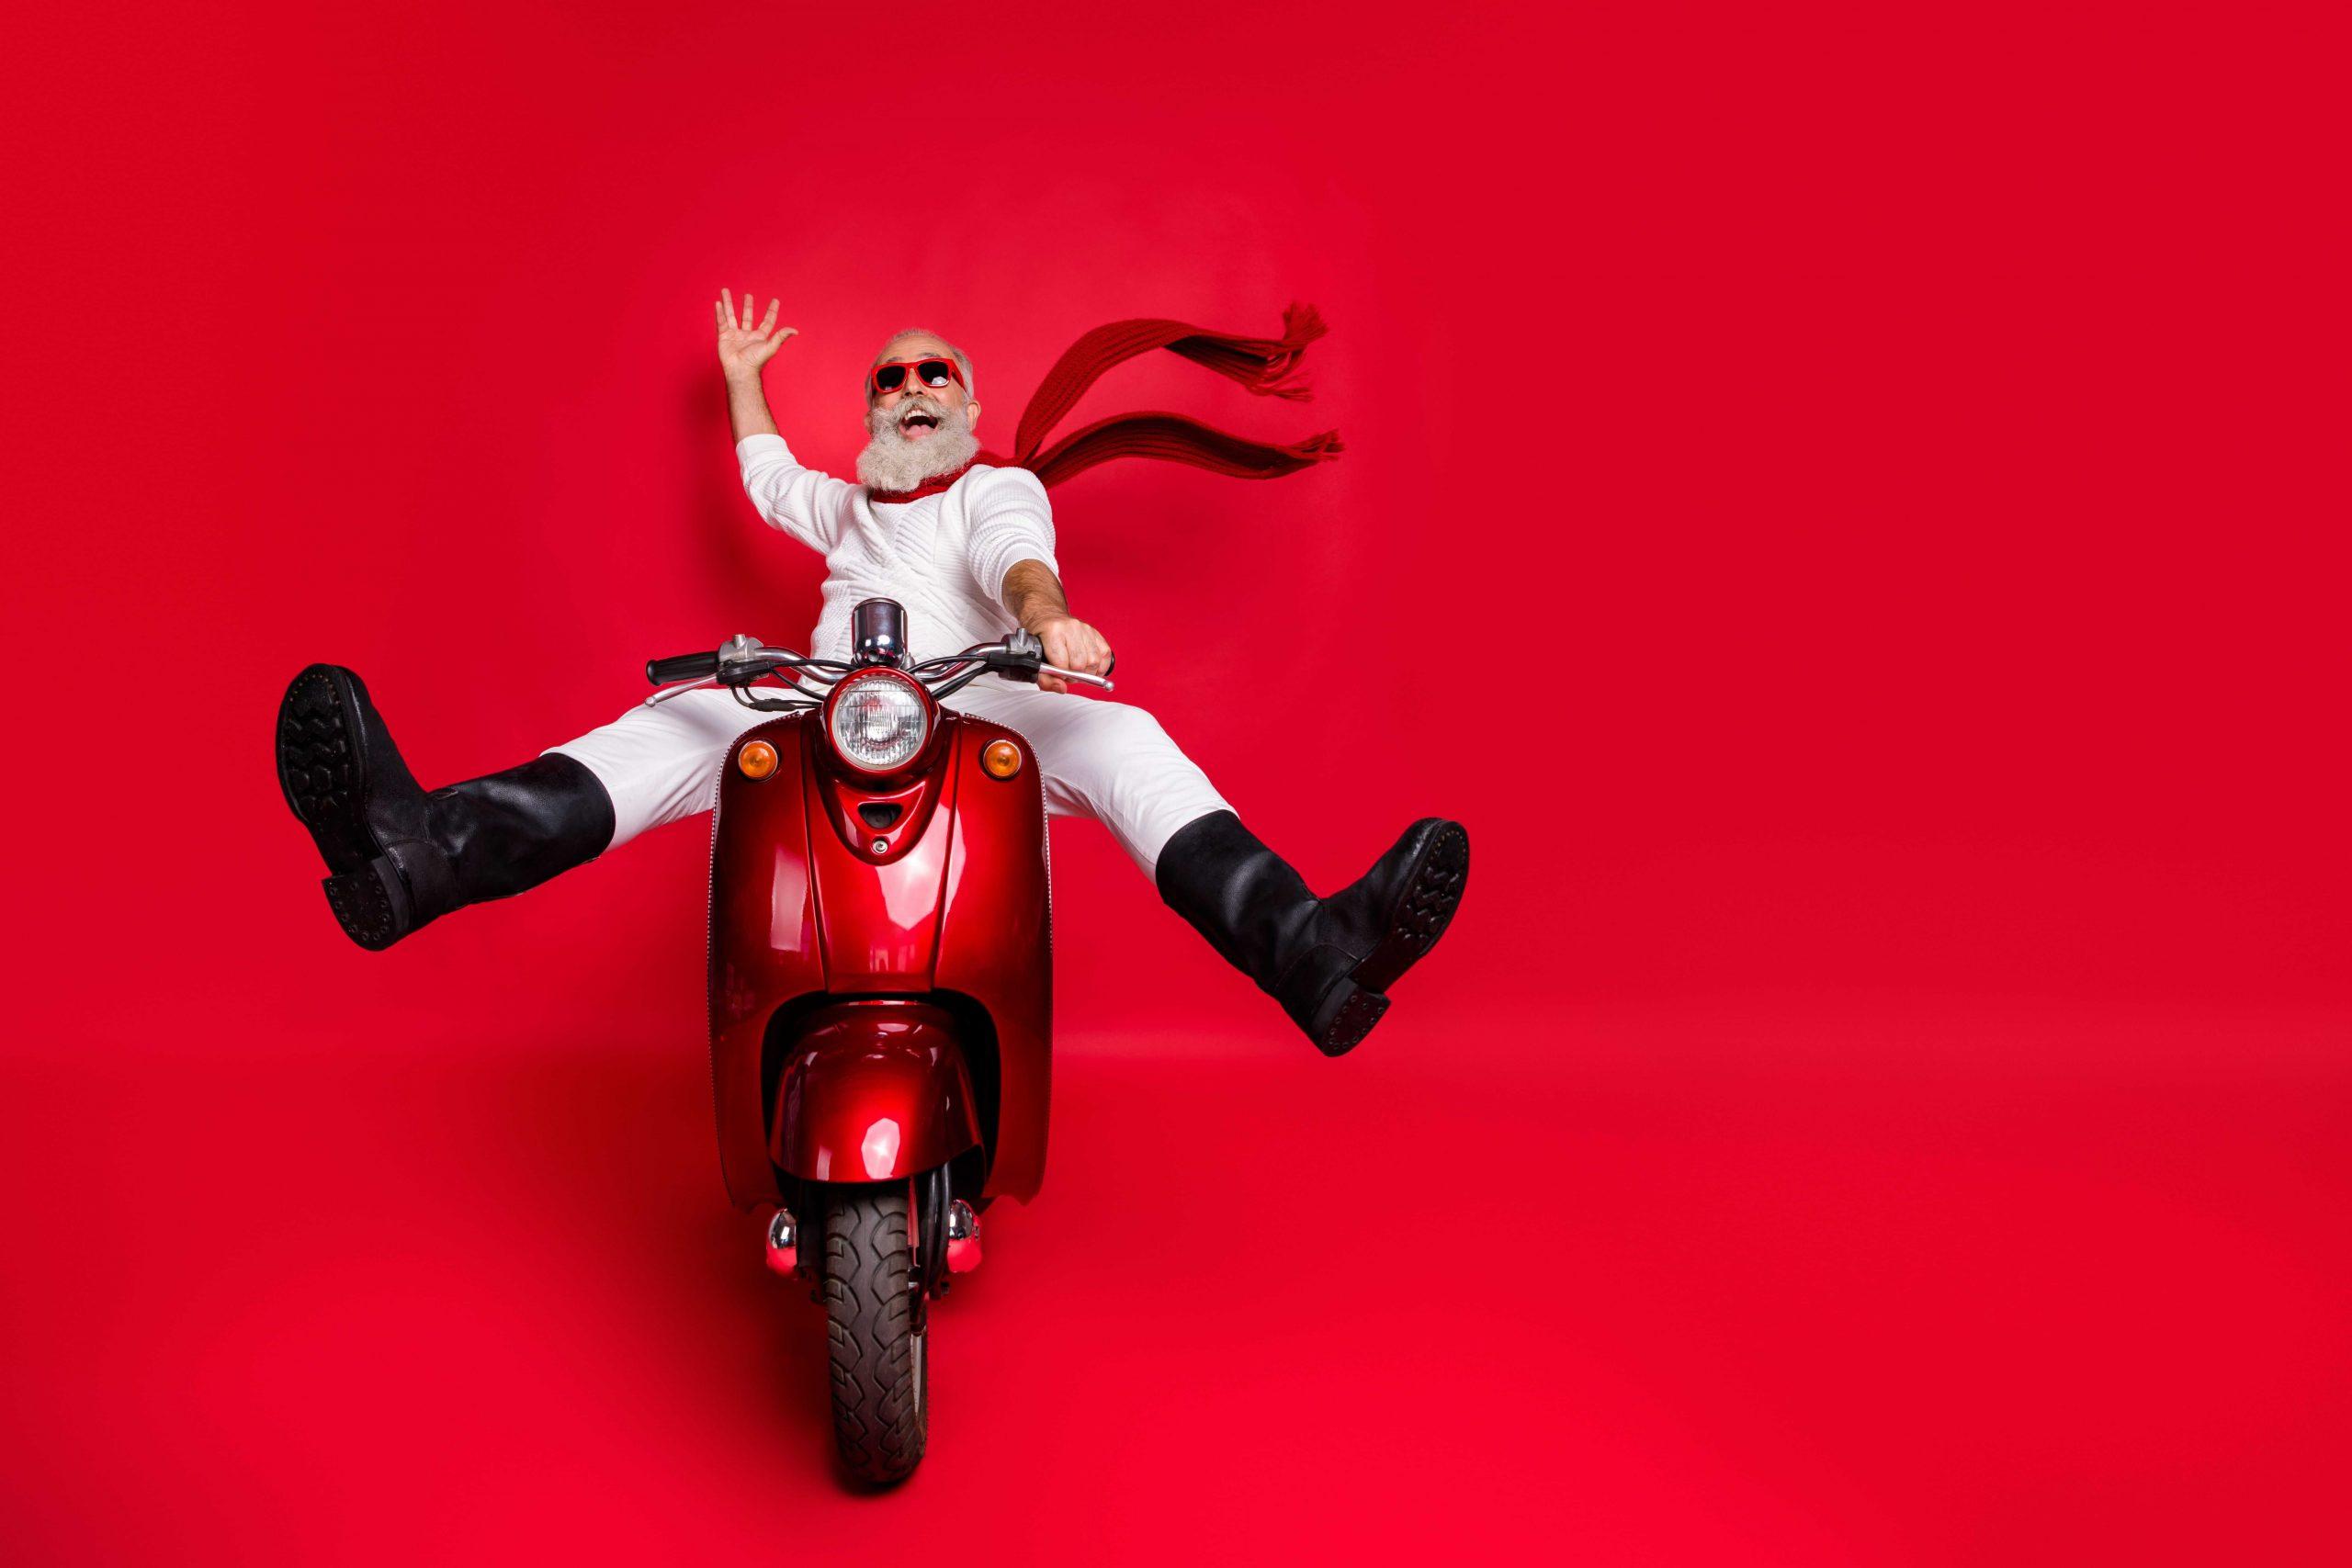 Senior man riding happily on a motorbike